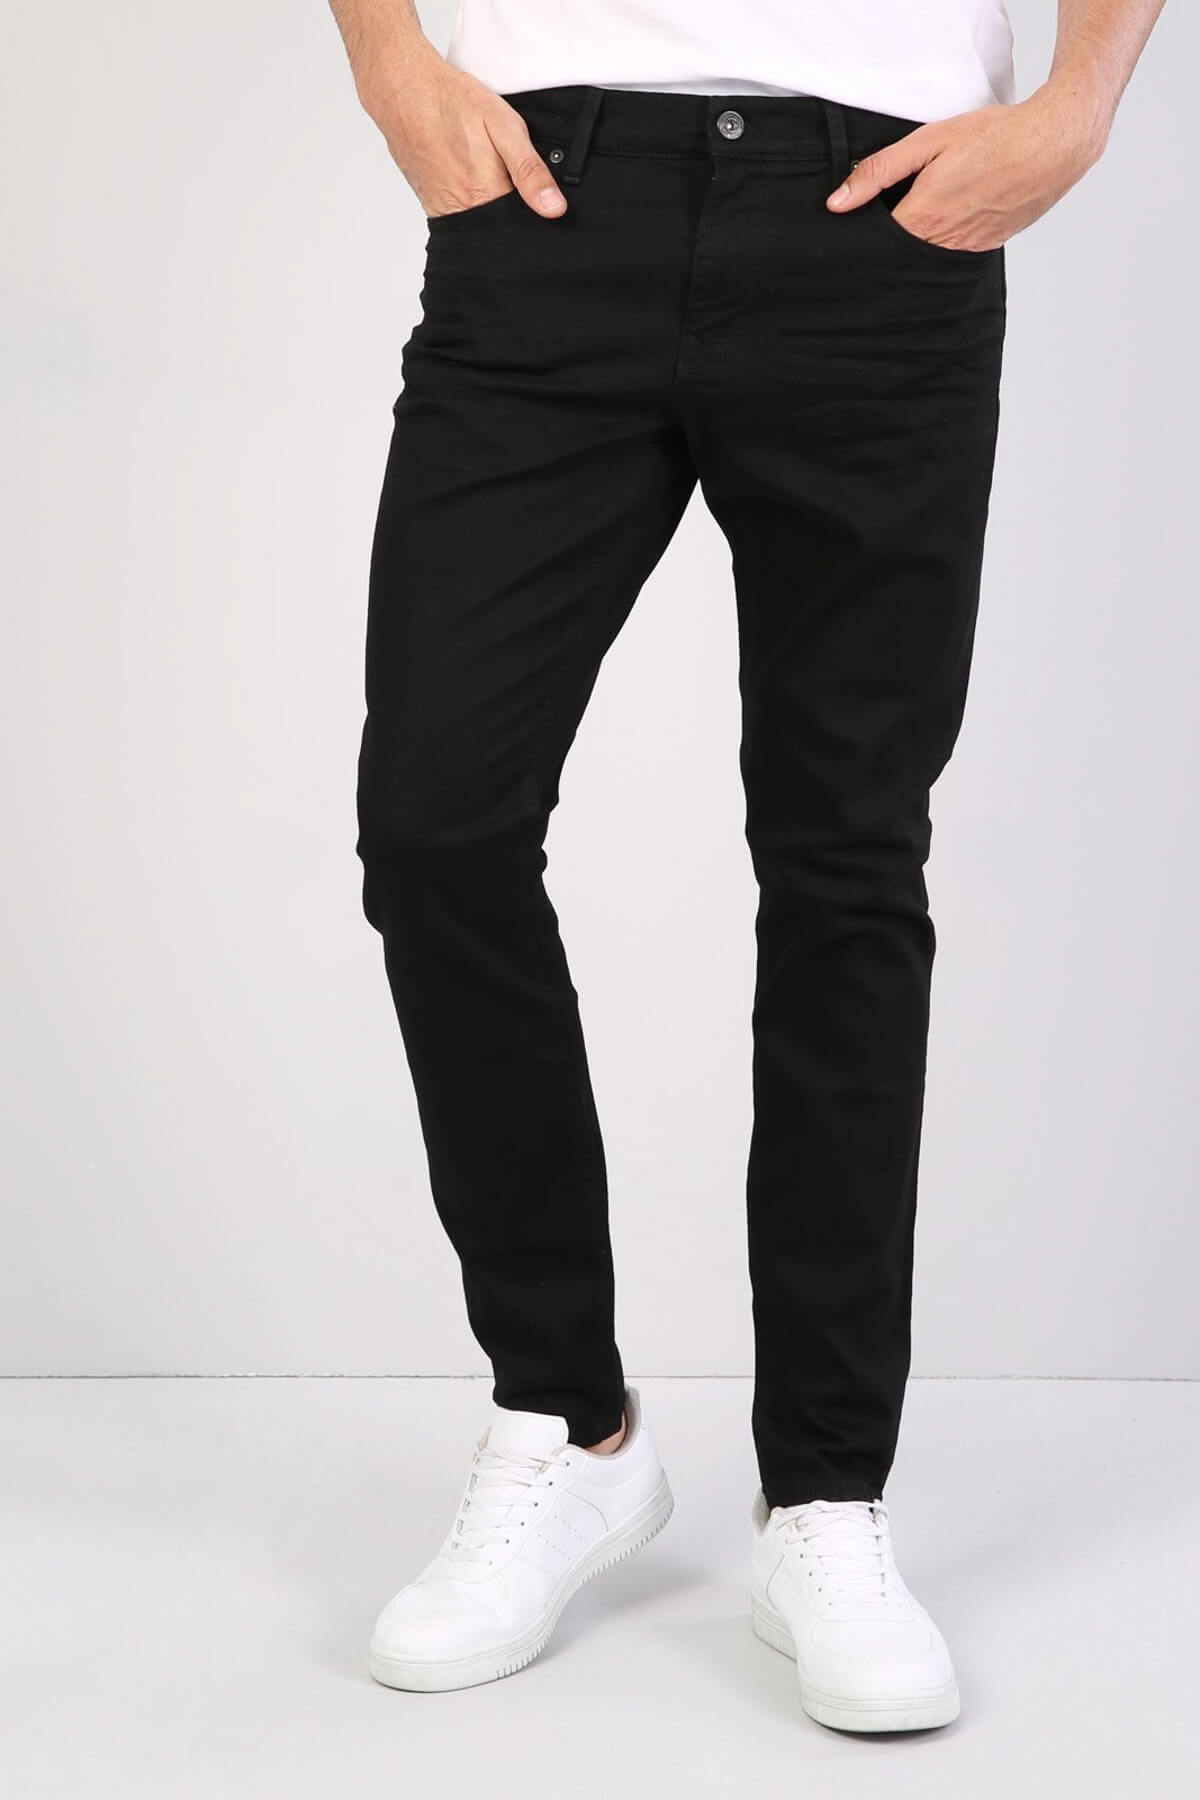 Siyah Erkek Pantolon CL1031097